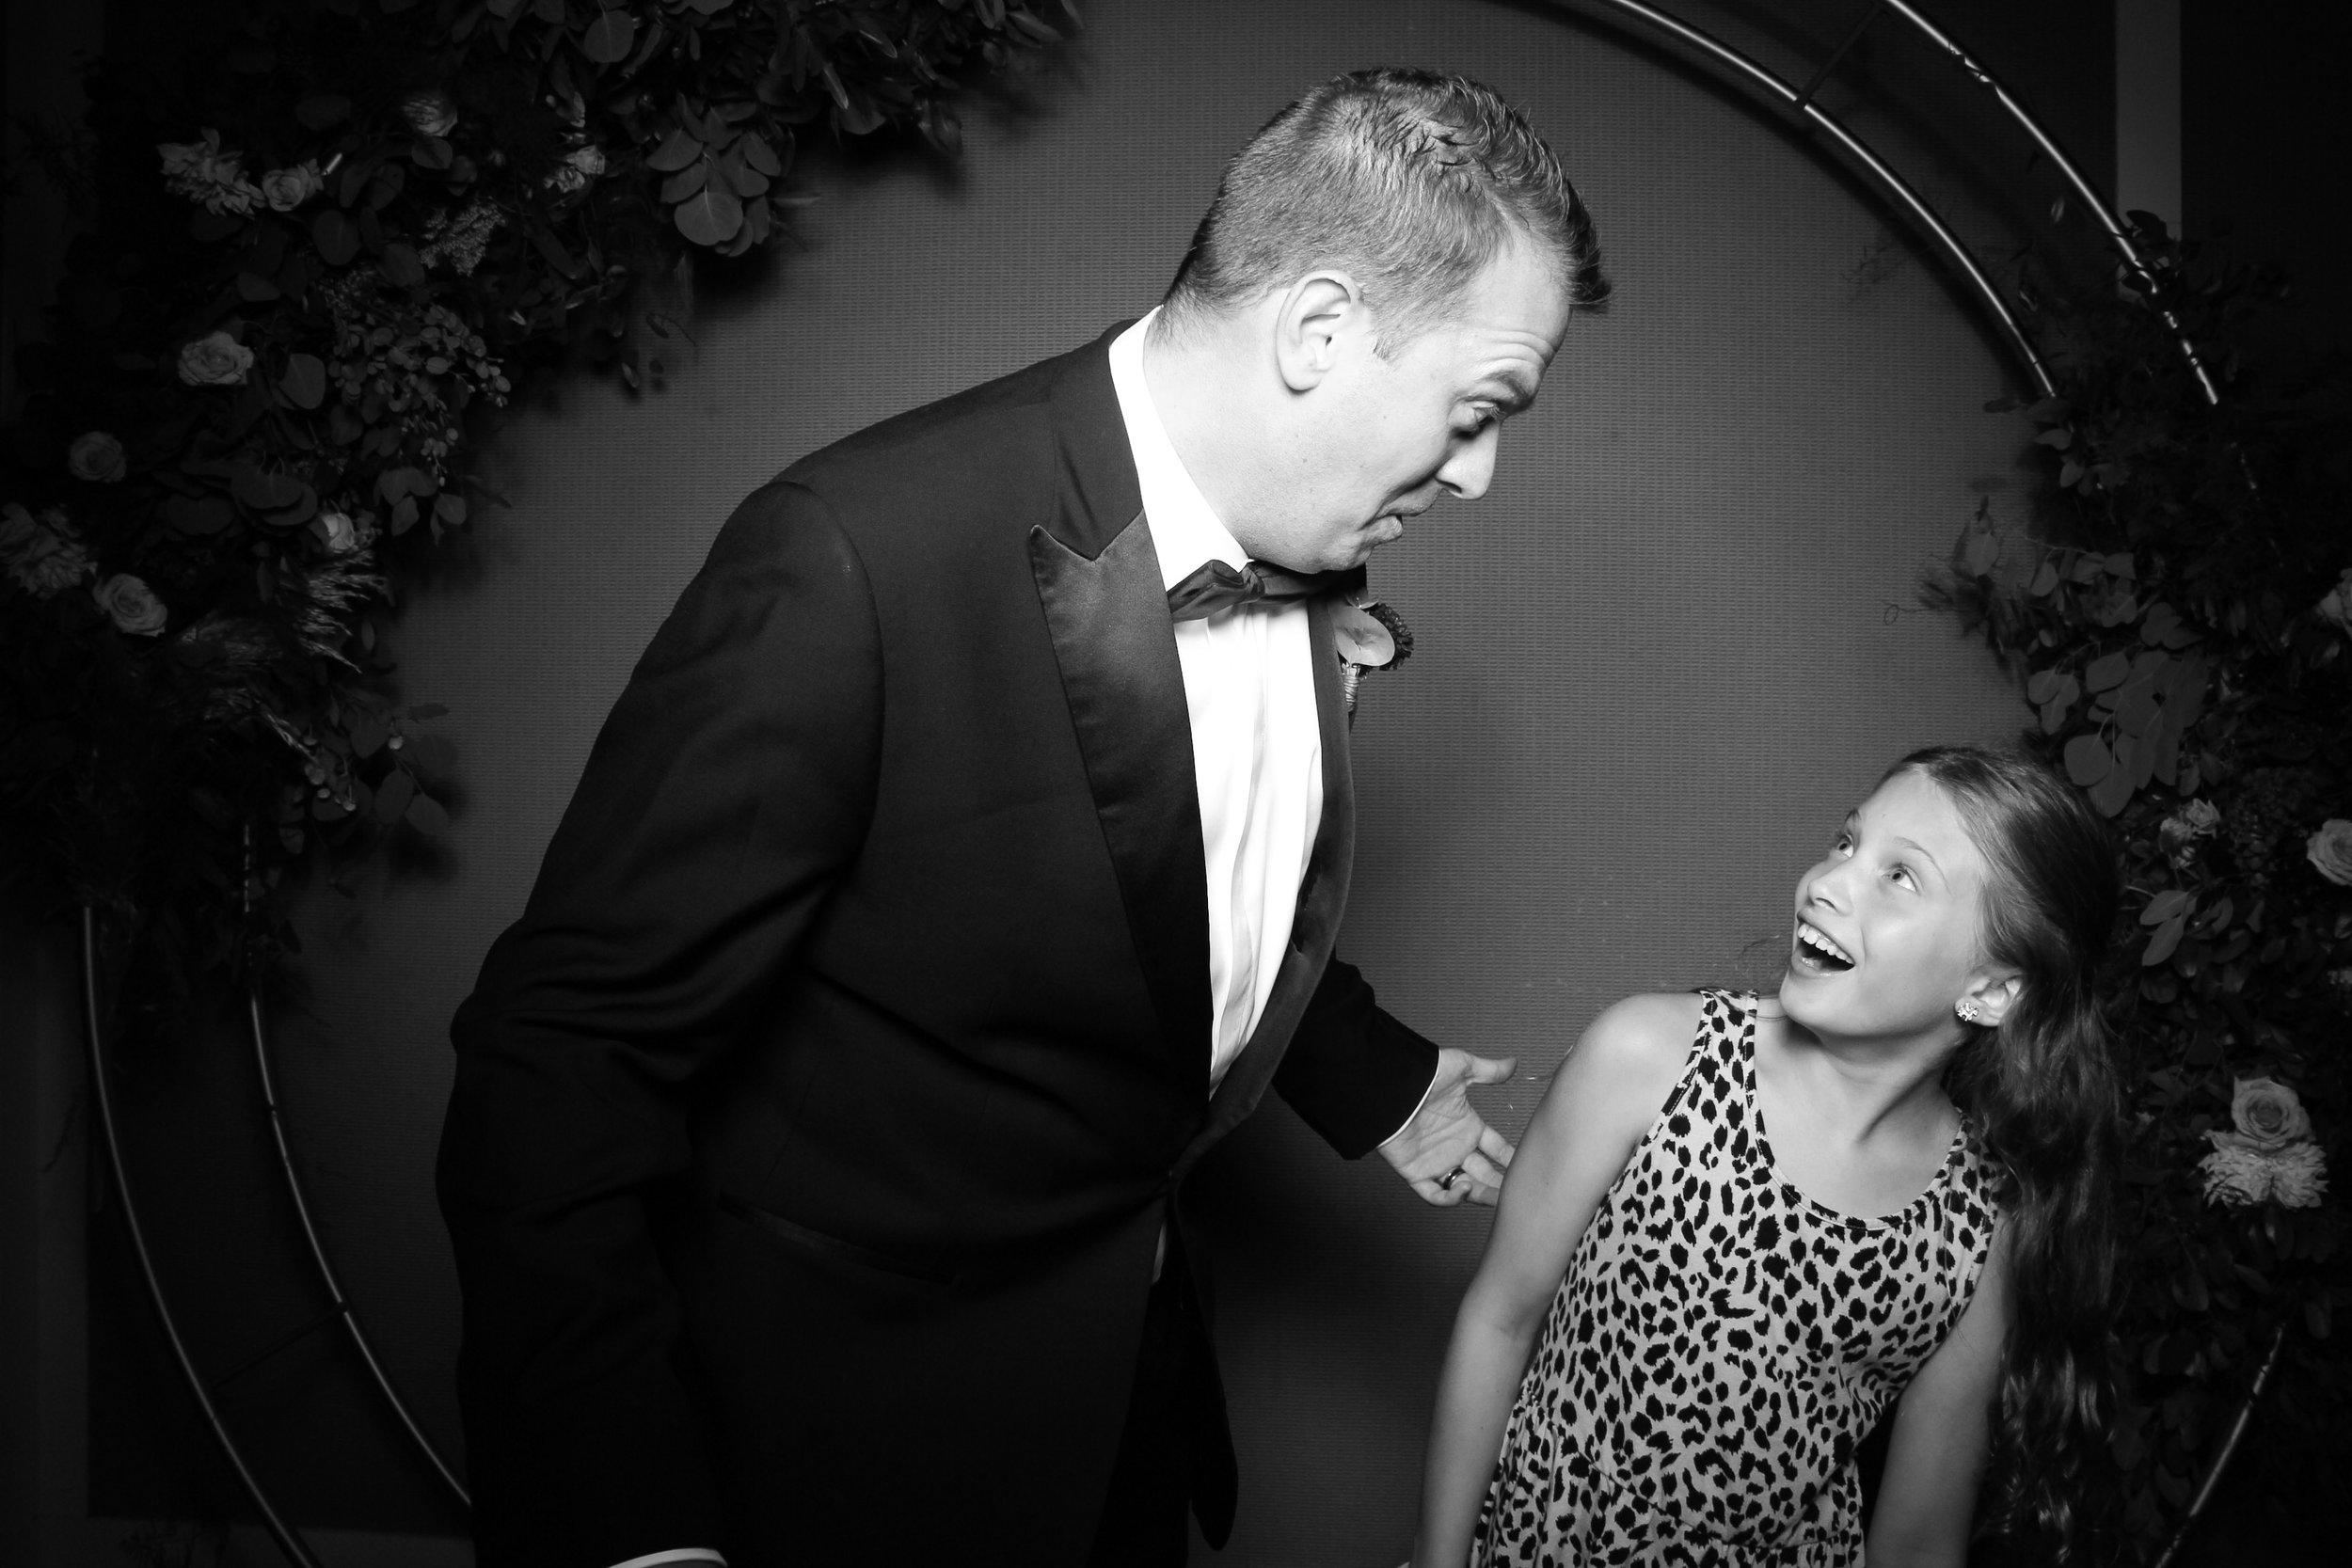 Metropolis_Ballroom_Wedding_Arlington_Heights_Photo_Booth_14.jpg